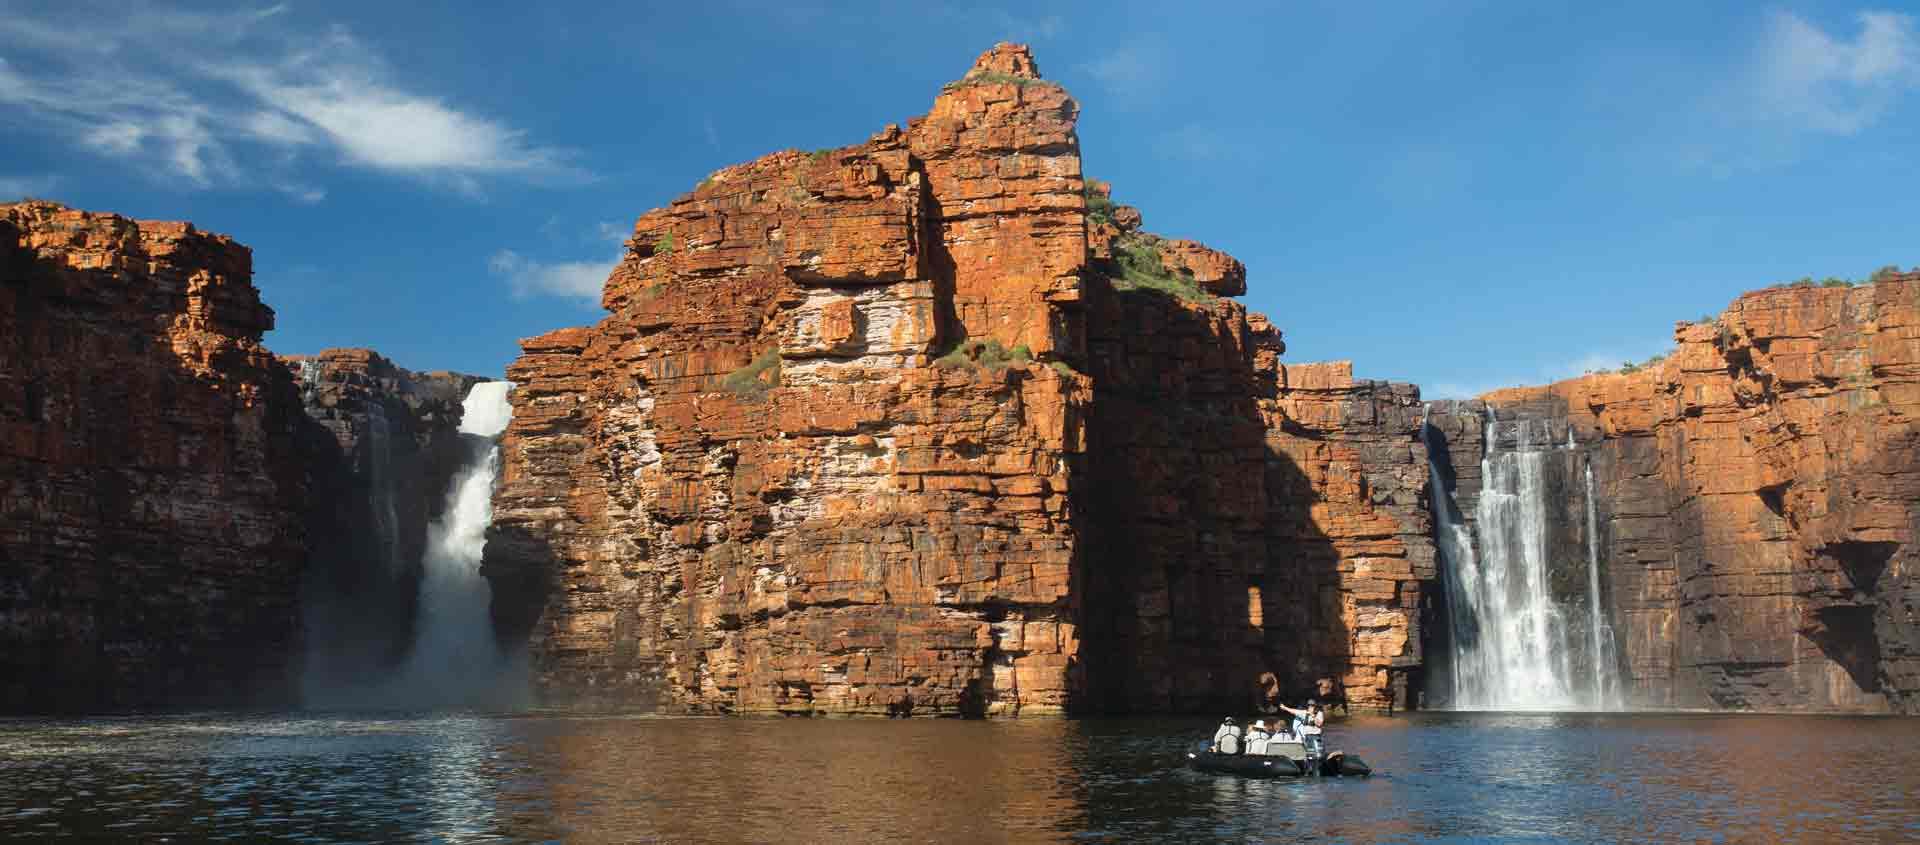 cruise Australia's west coast photo of King George Falls in the Kimberley